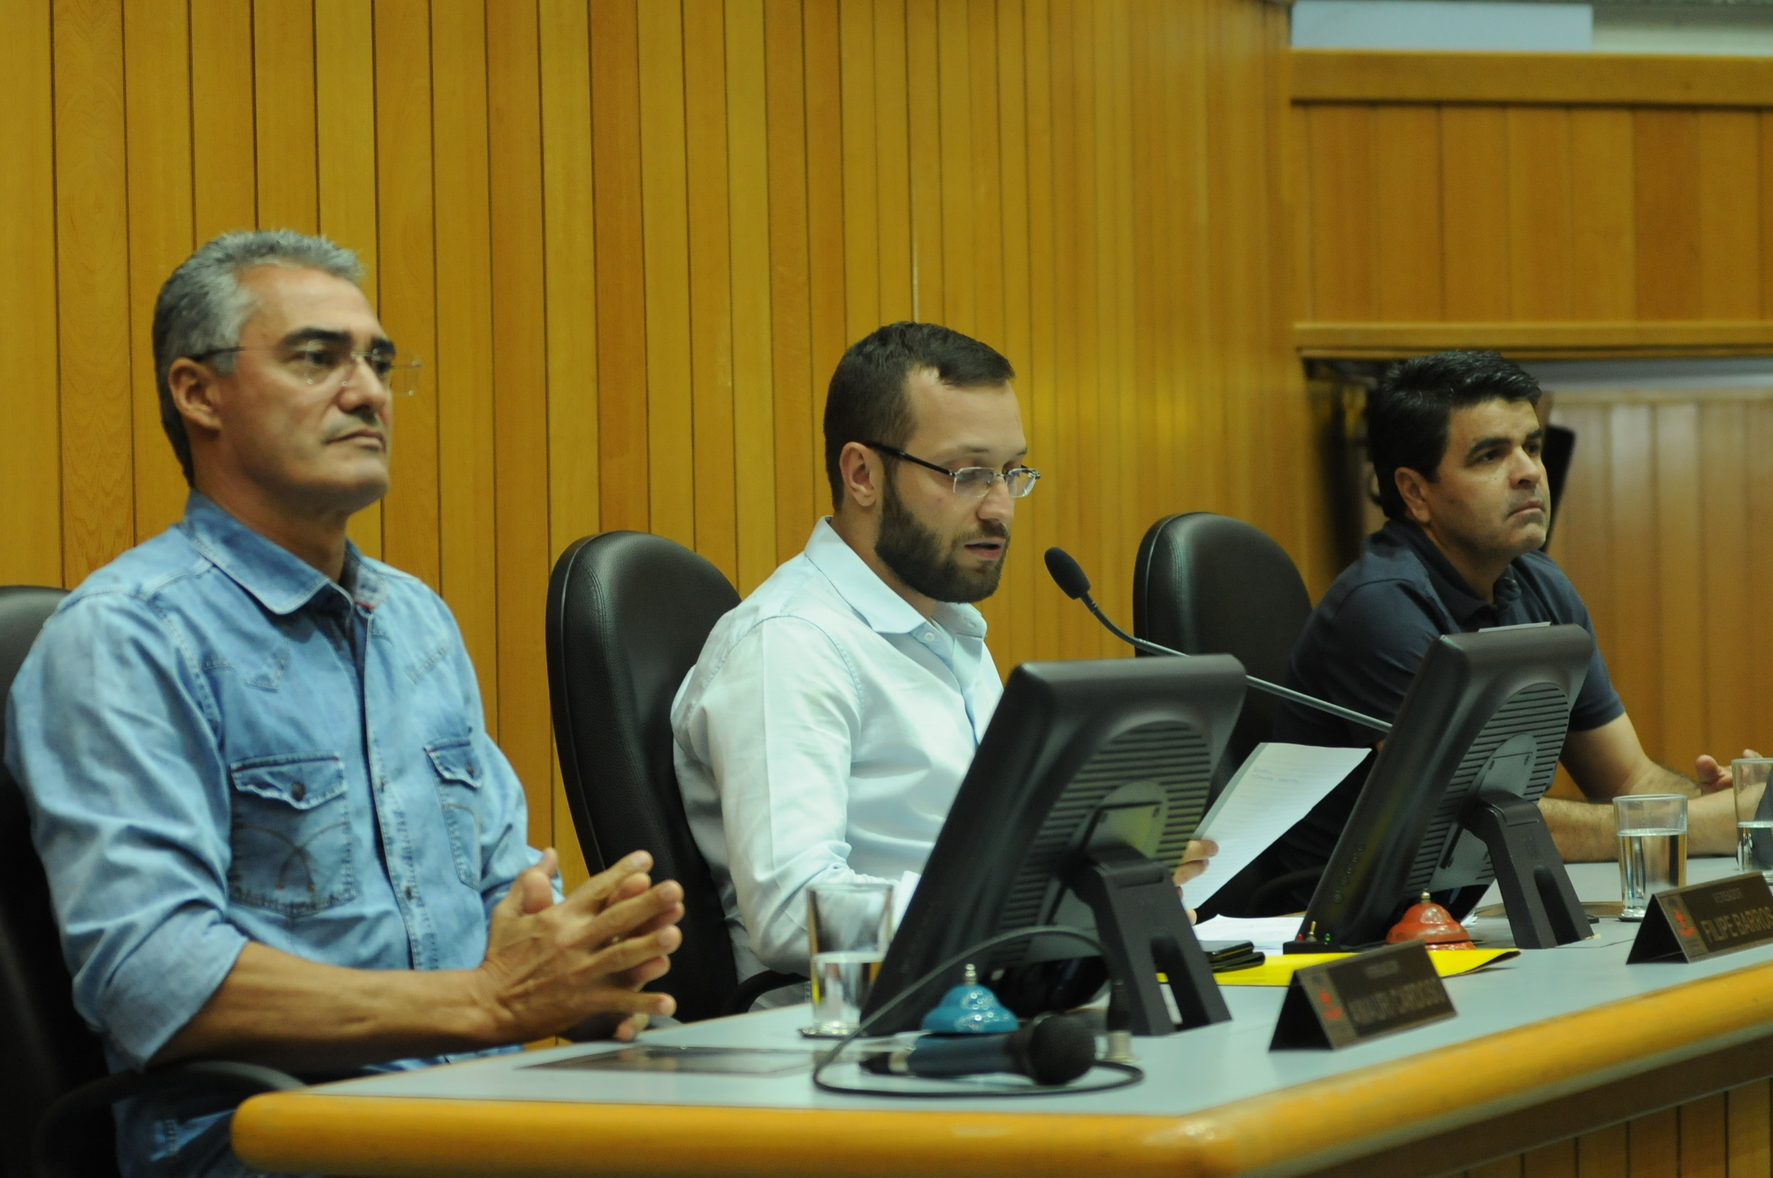 Vereadores Amauri Cardoso, Filipe Barros e Valdir dos Metalúrgicos. Foto: Devanir Parra/CML